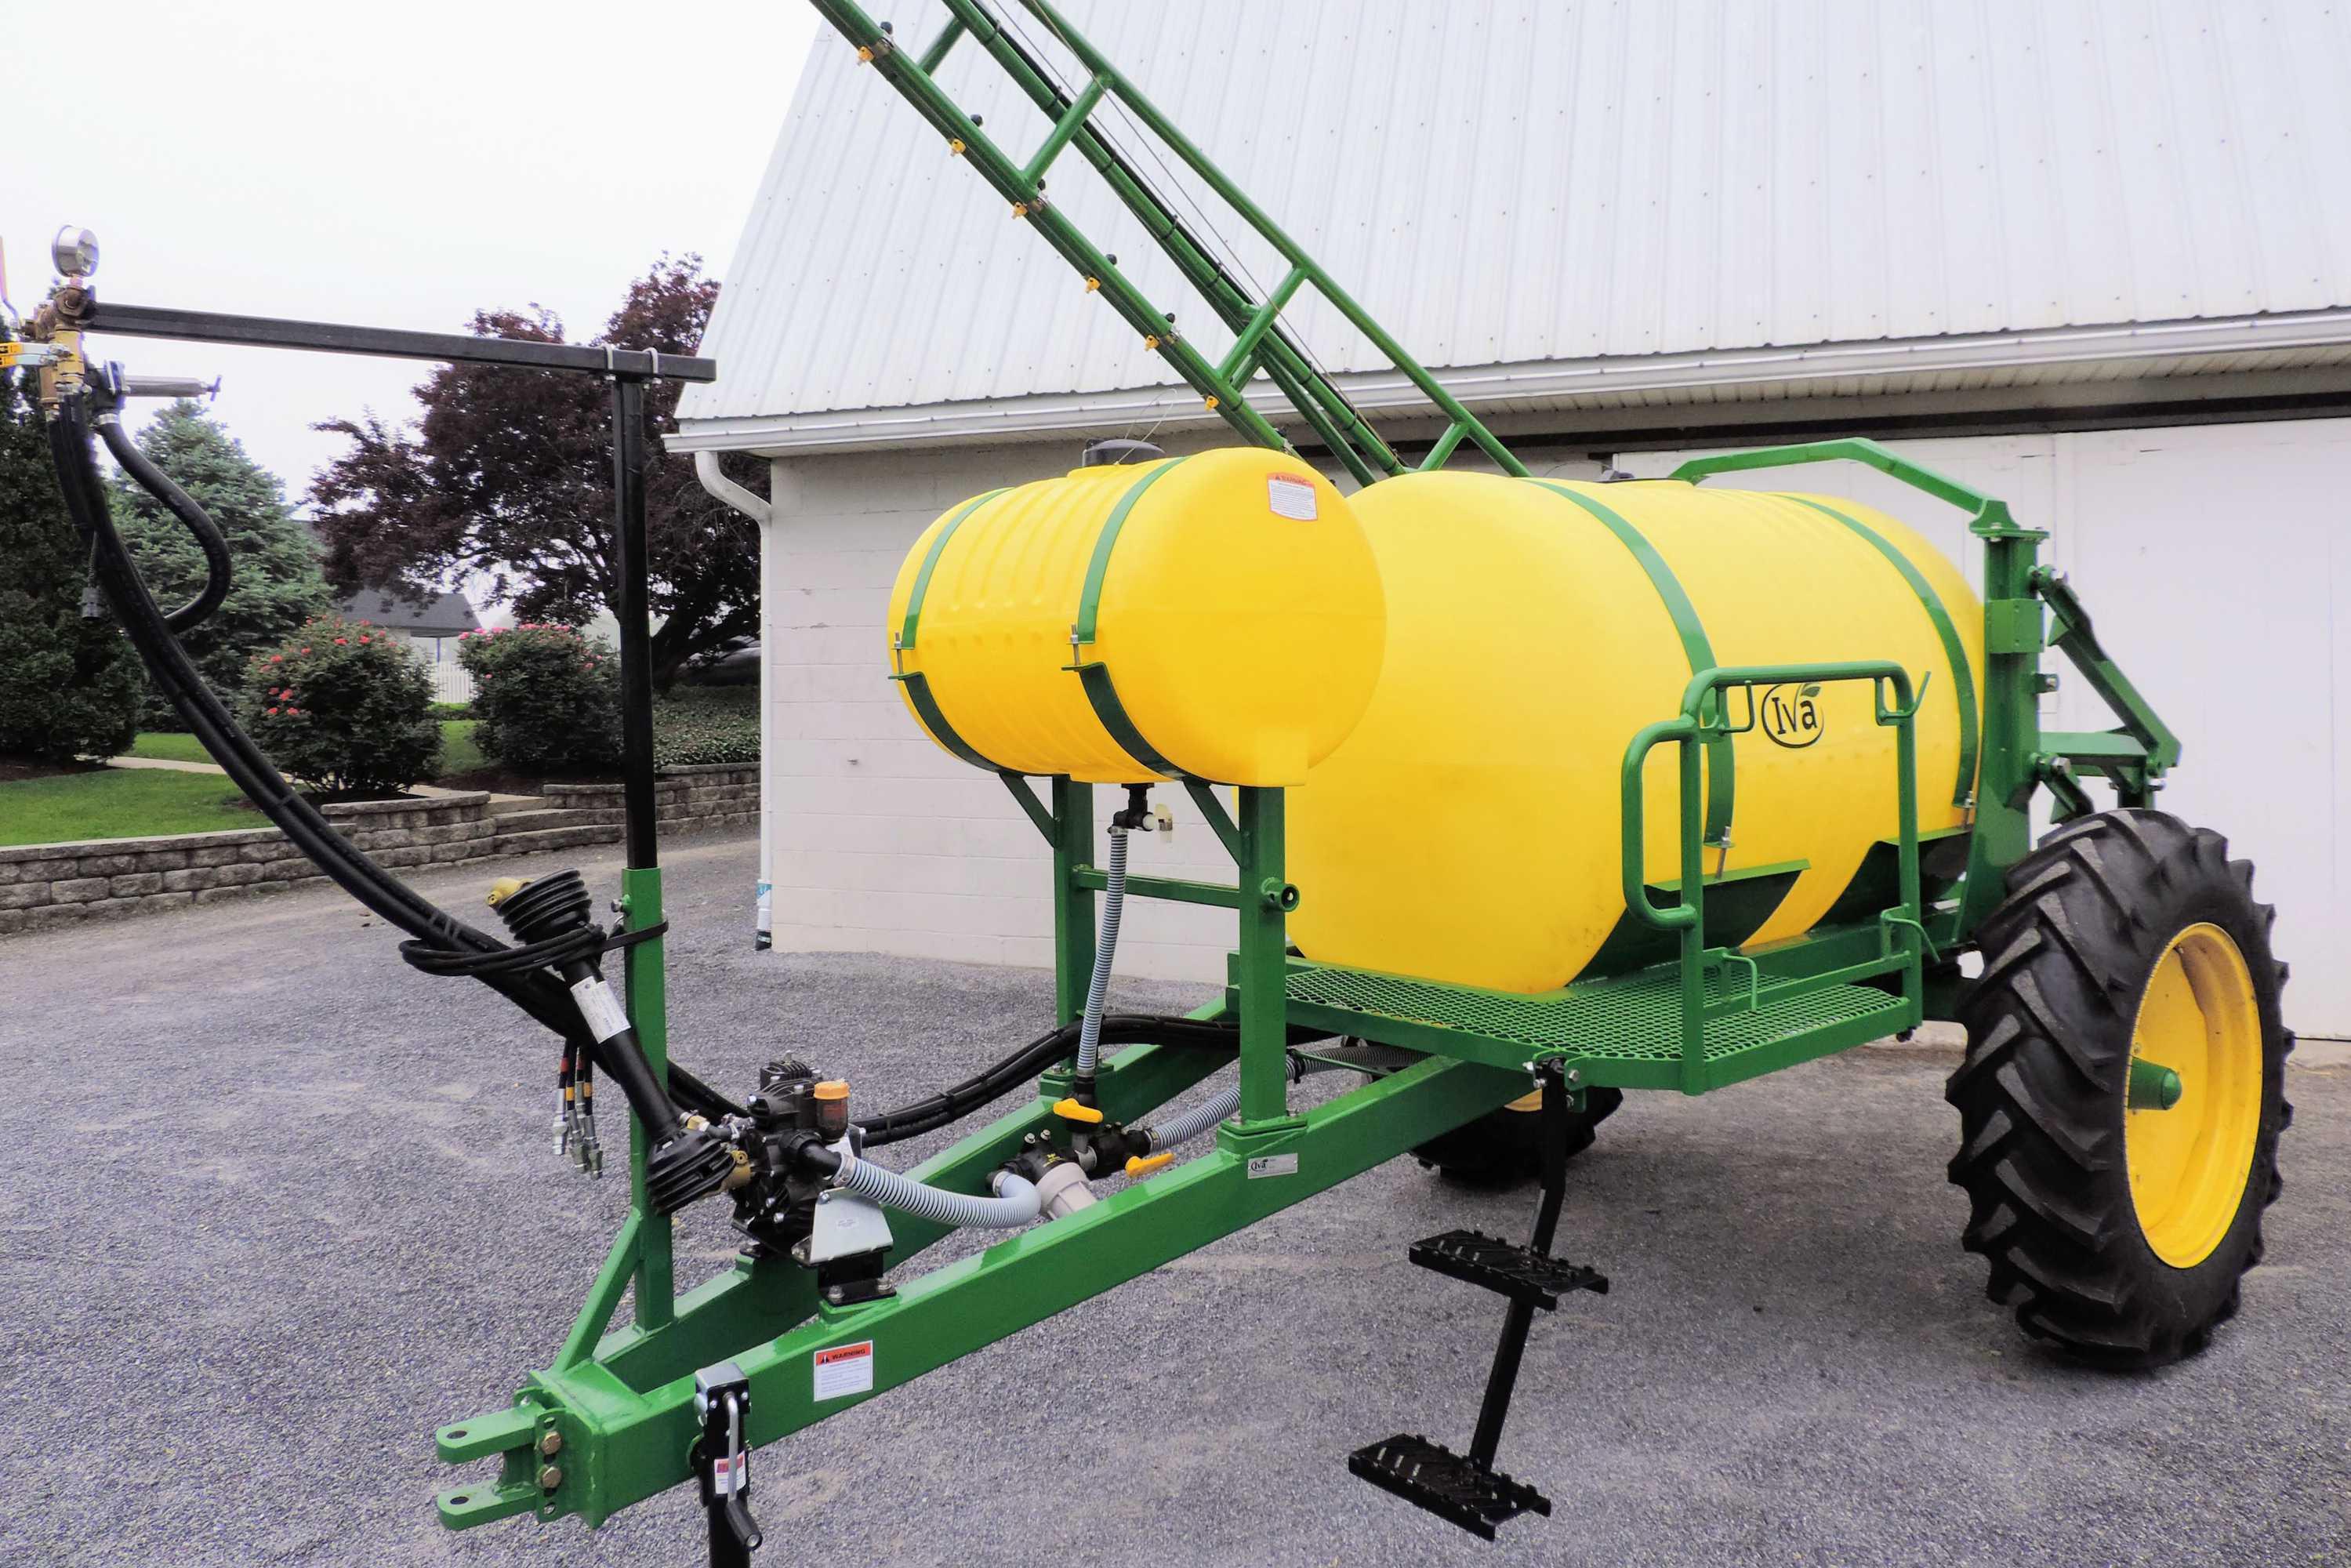 500 gallon trailer produce sprayer with 30' single sided boom